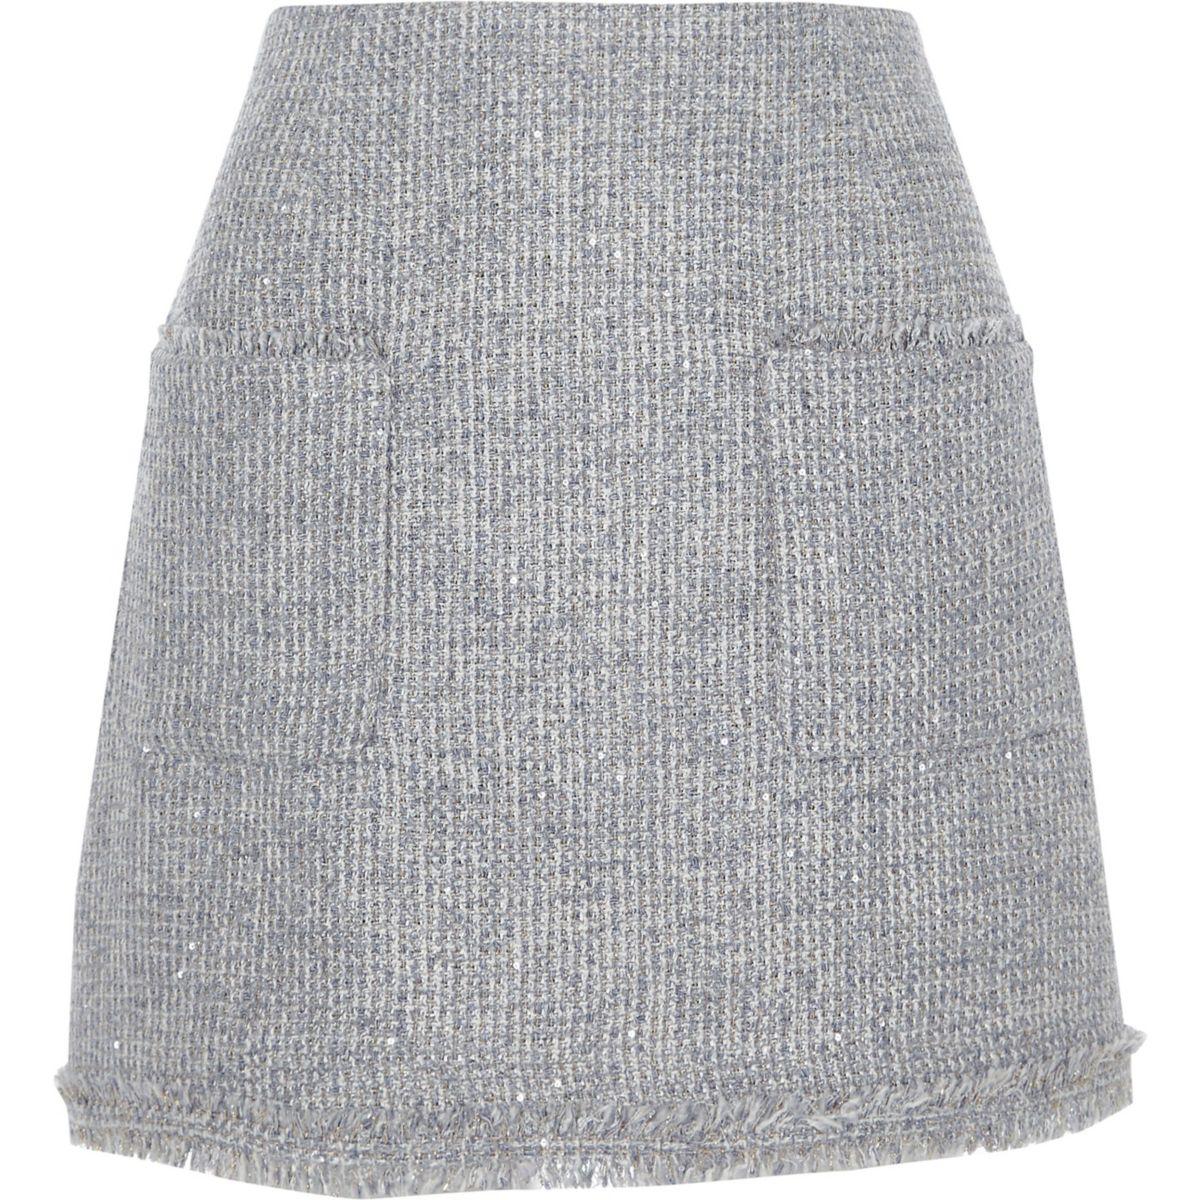 Grey boucle knit A line mini skirt